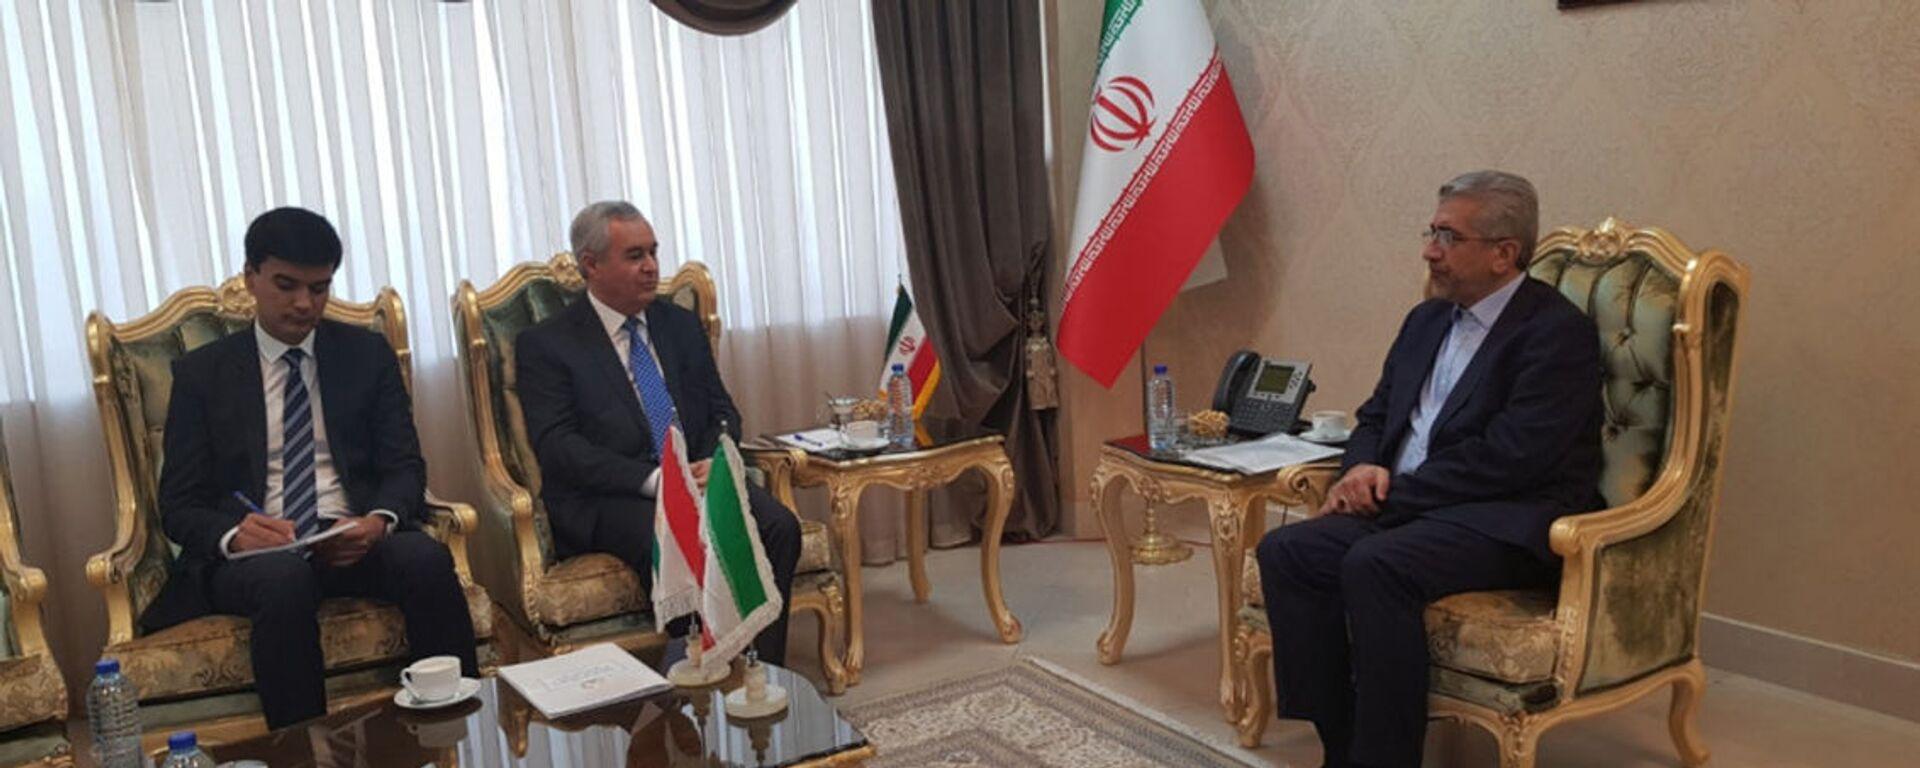 Посол Таджикистана в Иране Низомиддин Зохиди провел встречу с министром энергетики Ирана Ризо Ардакониён  - Sputnik Таджикистан, 1920, 16.05.2021